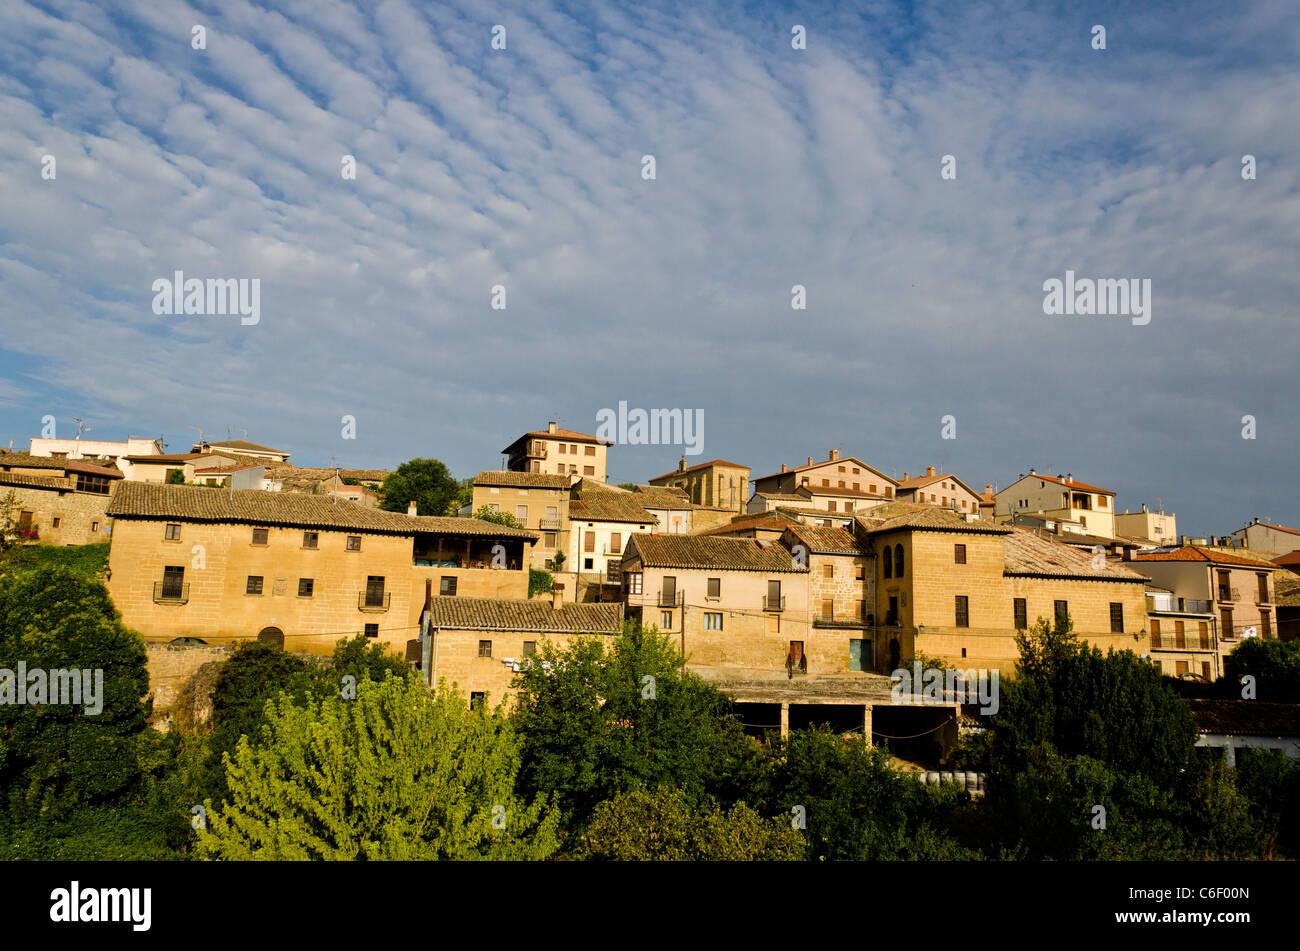 Villabuena de alava at dawn la rioja spain stock photo for Villabuena de alava